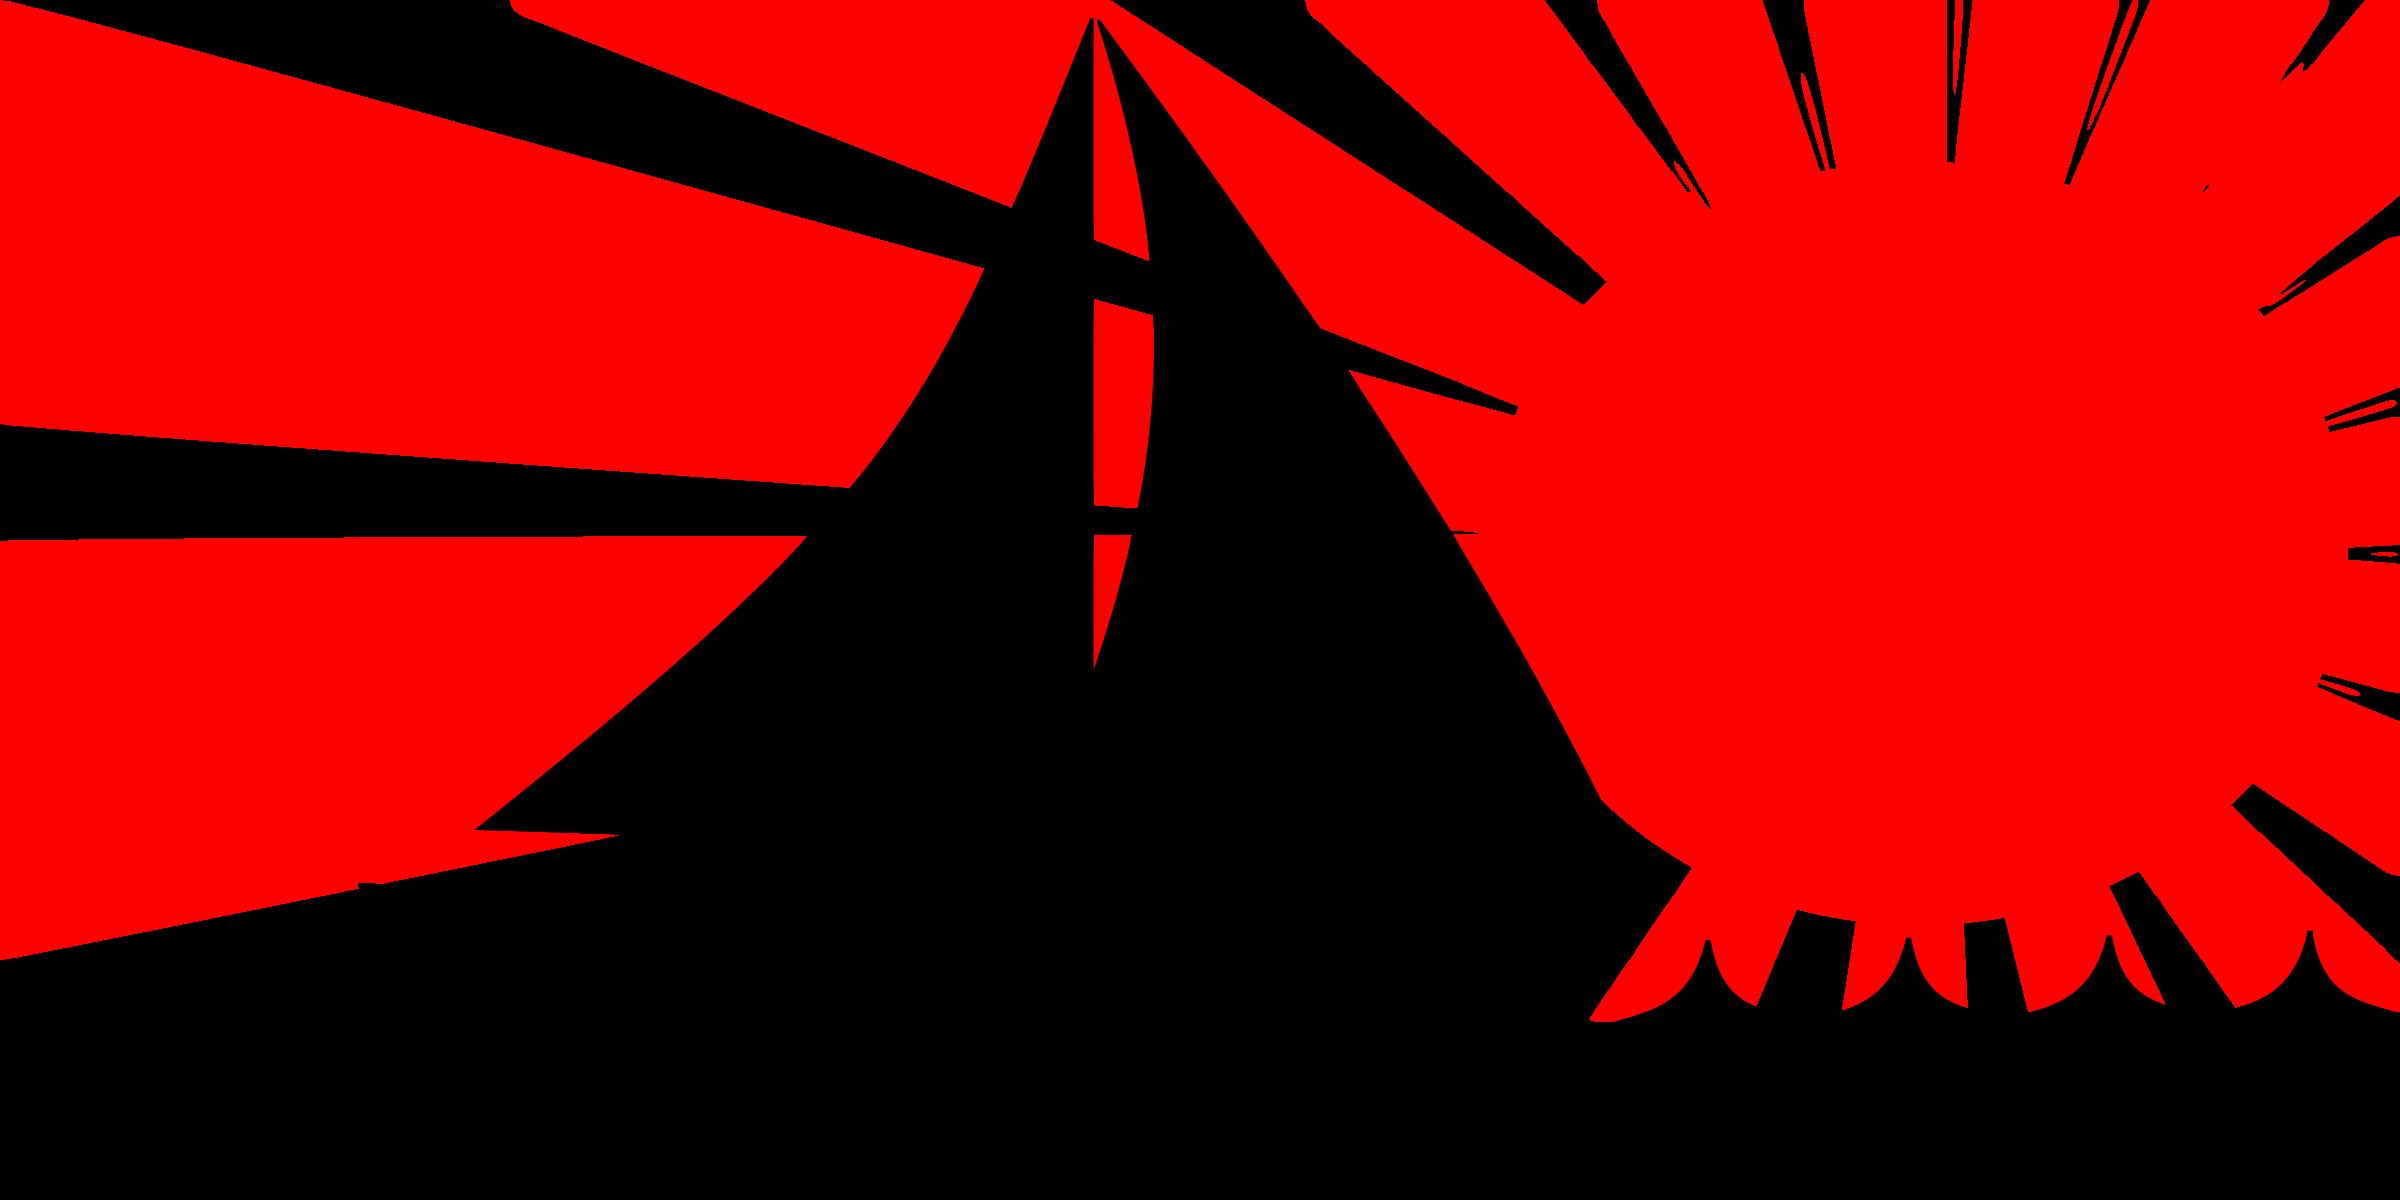 sunset clipart red sun